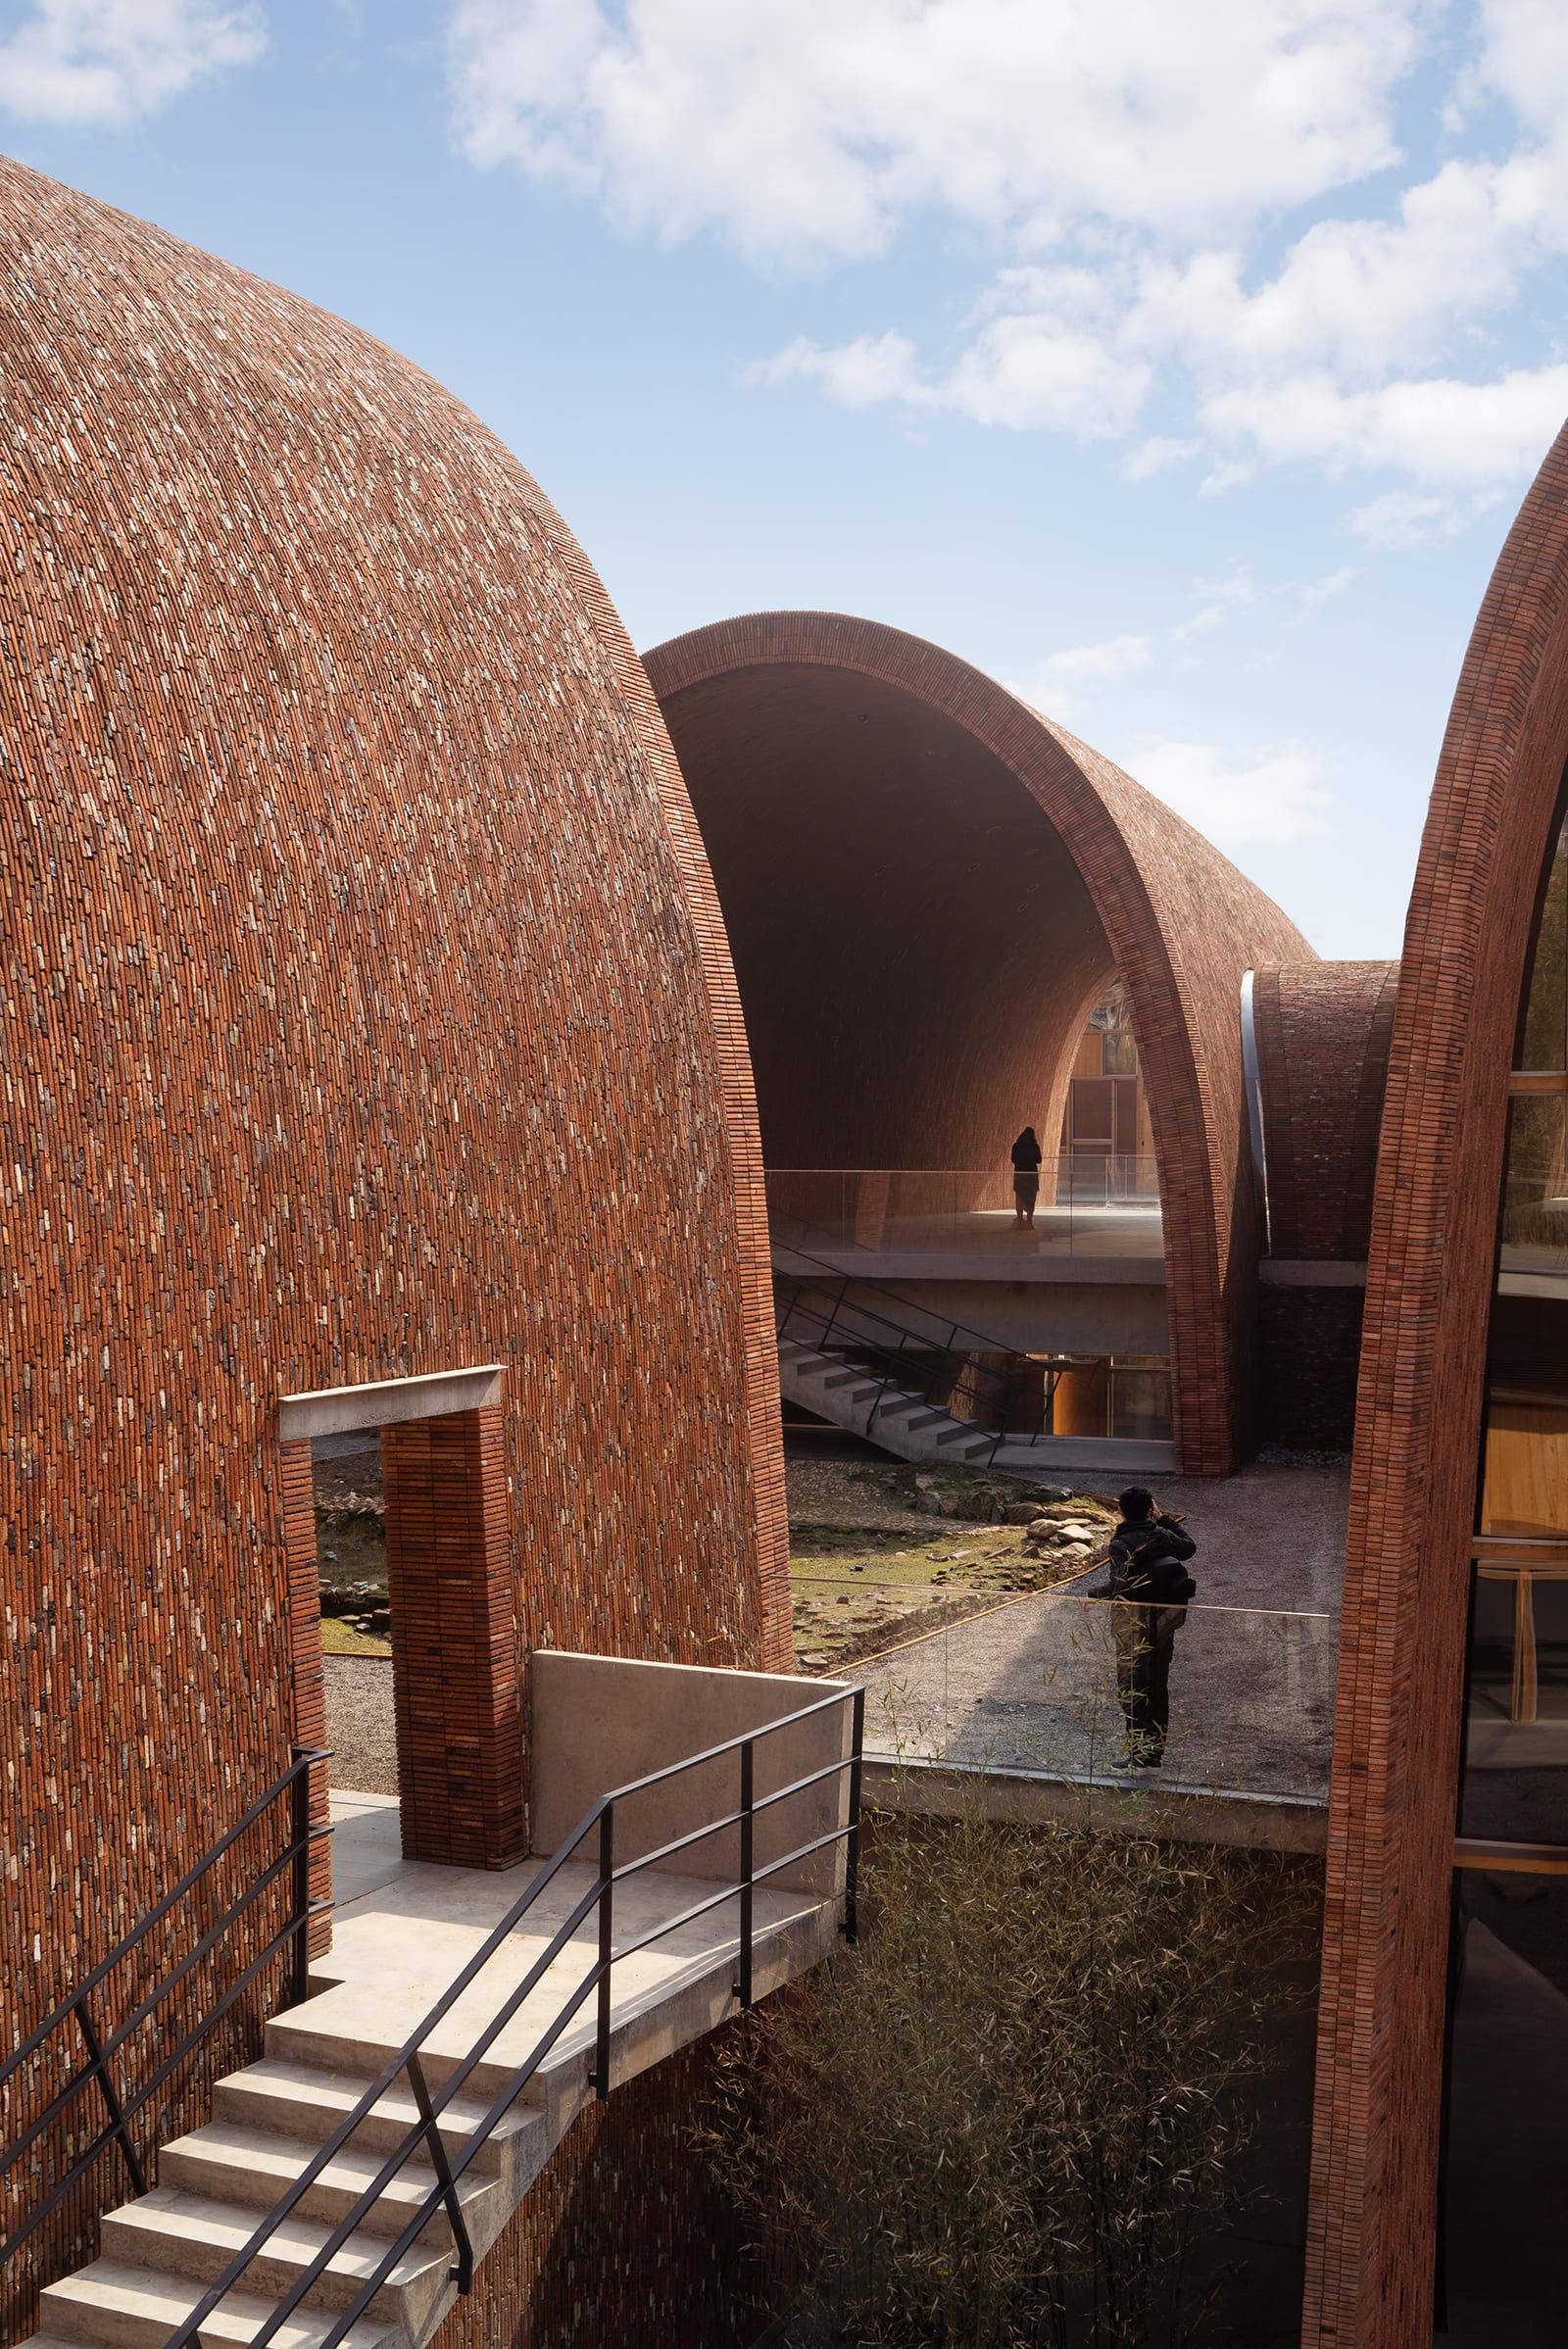 Imperial Kiln Museum in Jingdezhen  - 4.2 ©schranimage 1 41